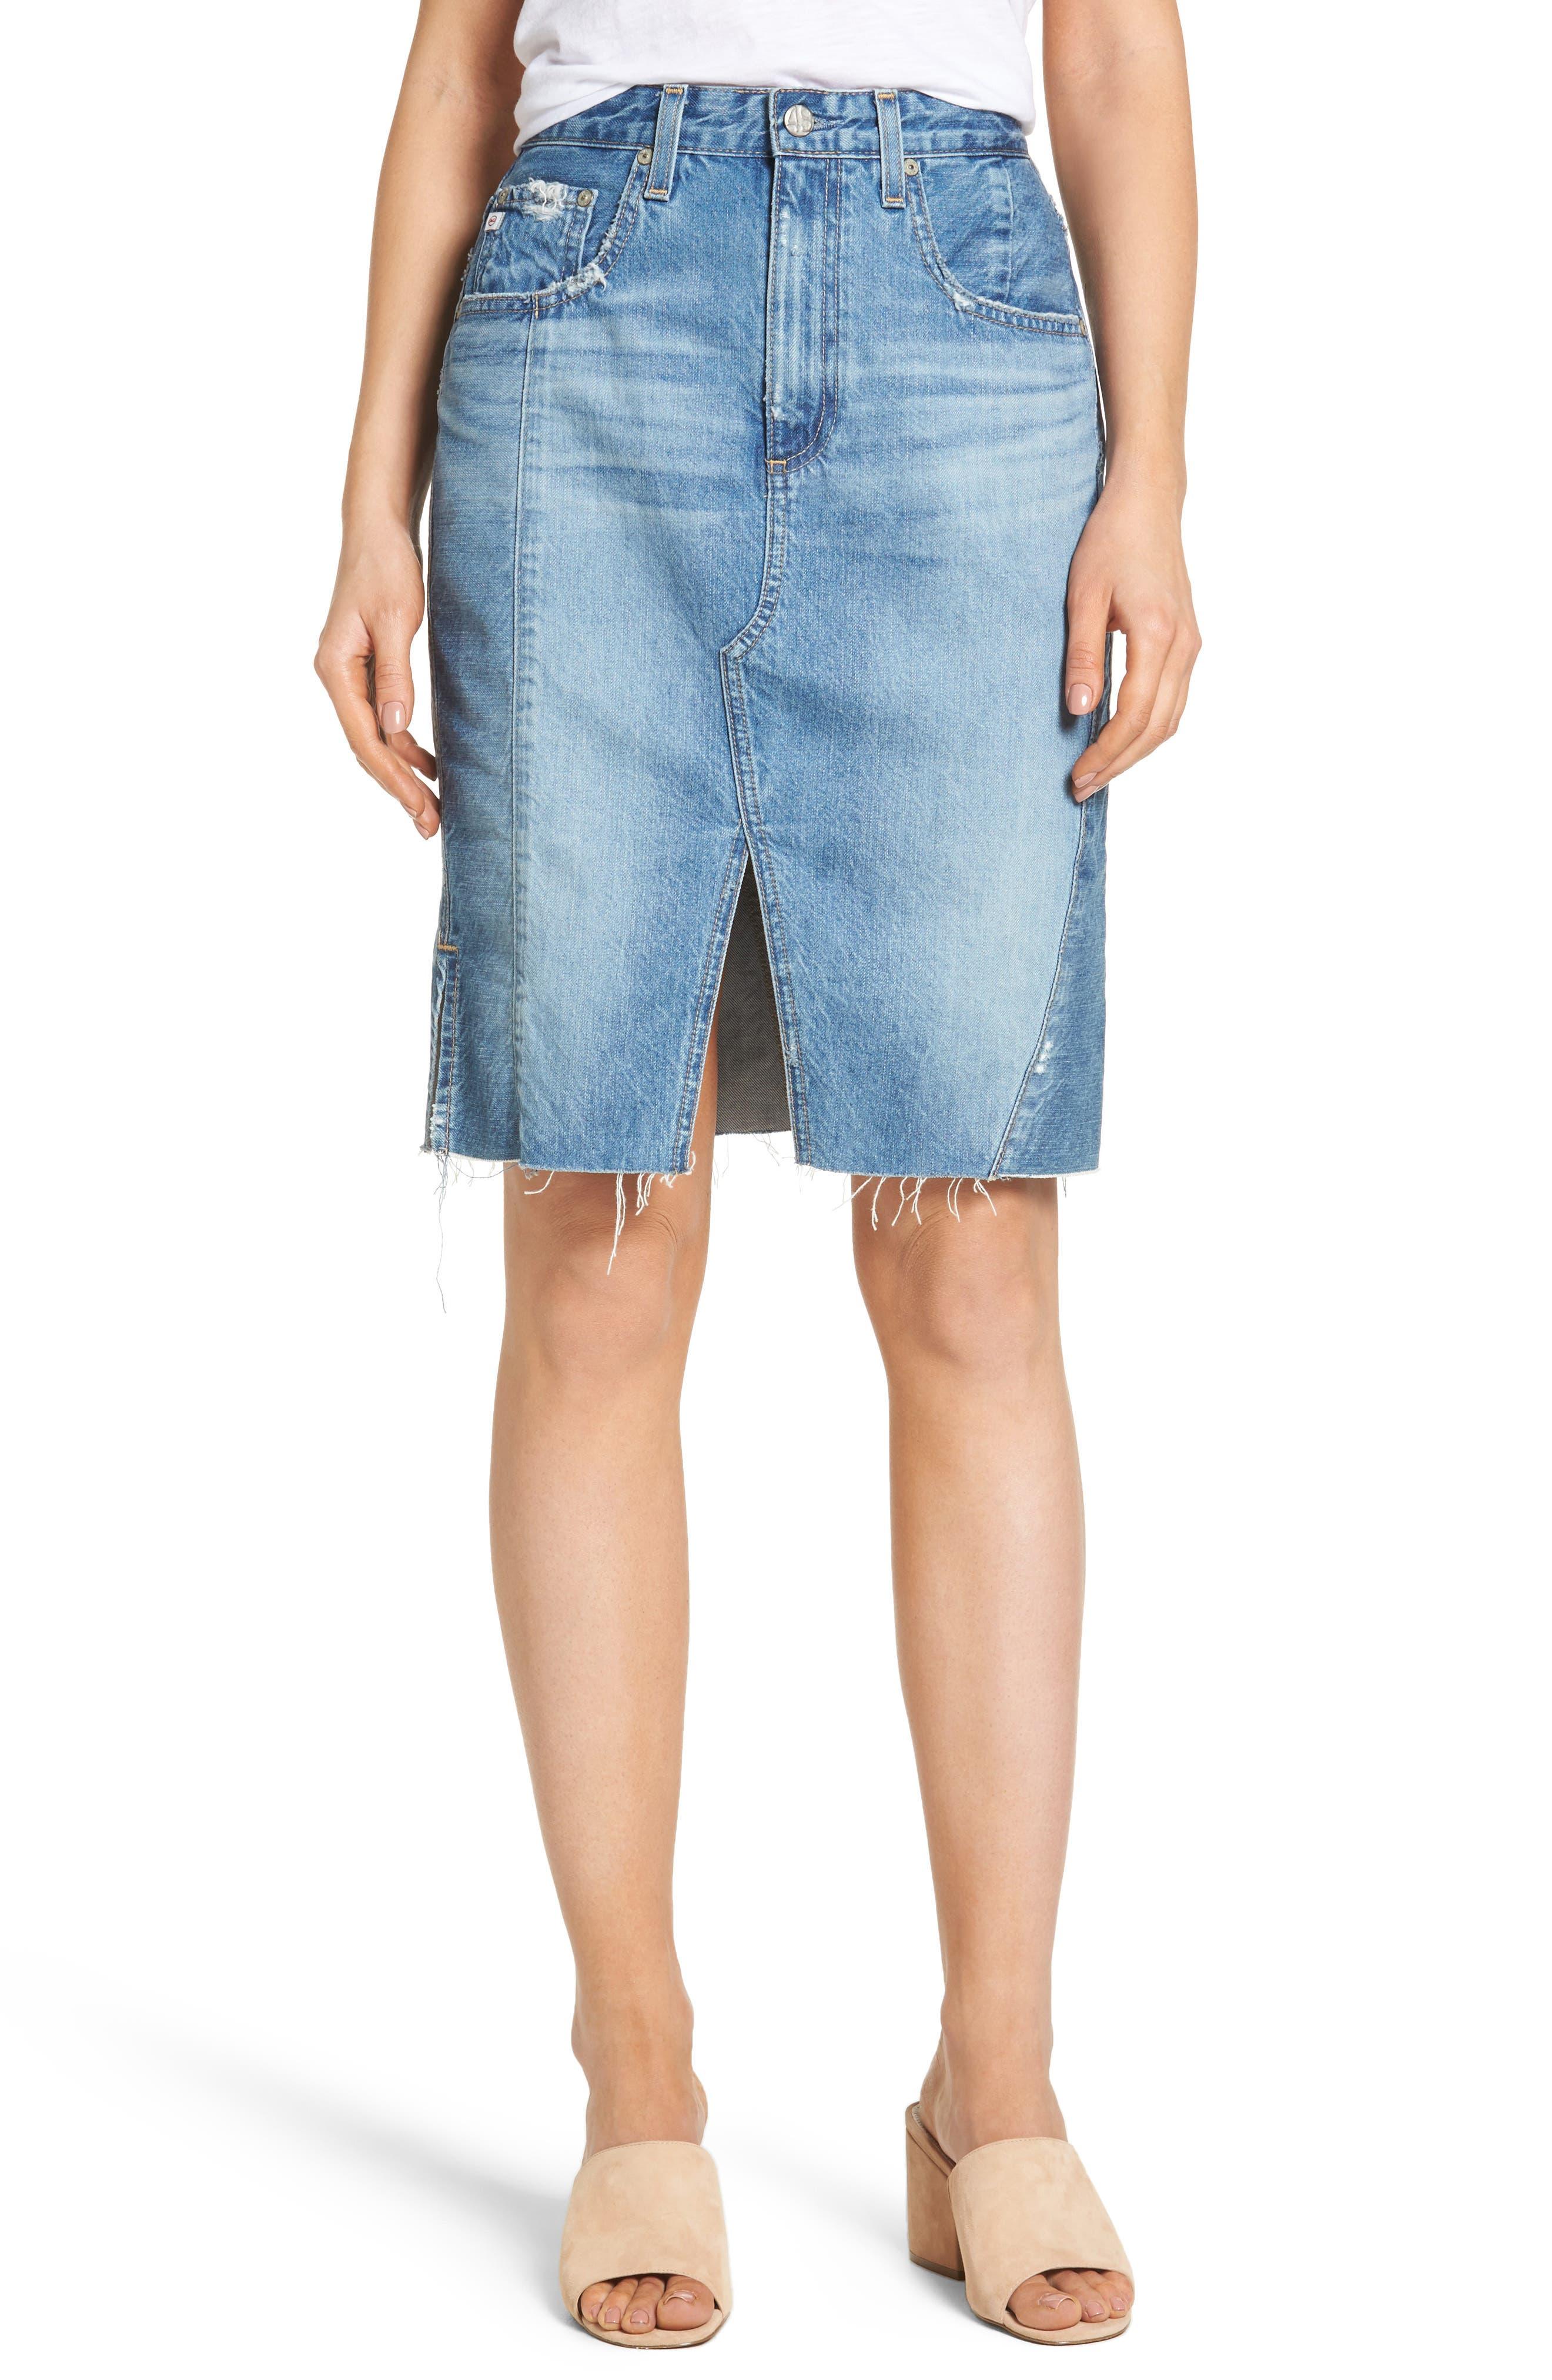 AG The Emery High Waist Denim Skirt